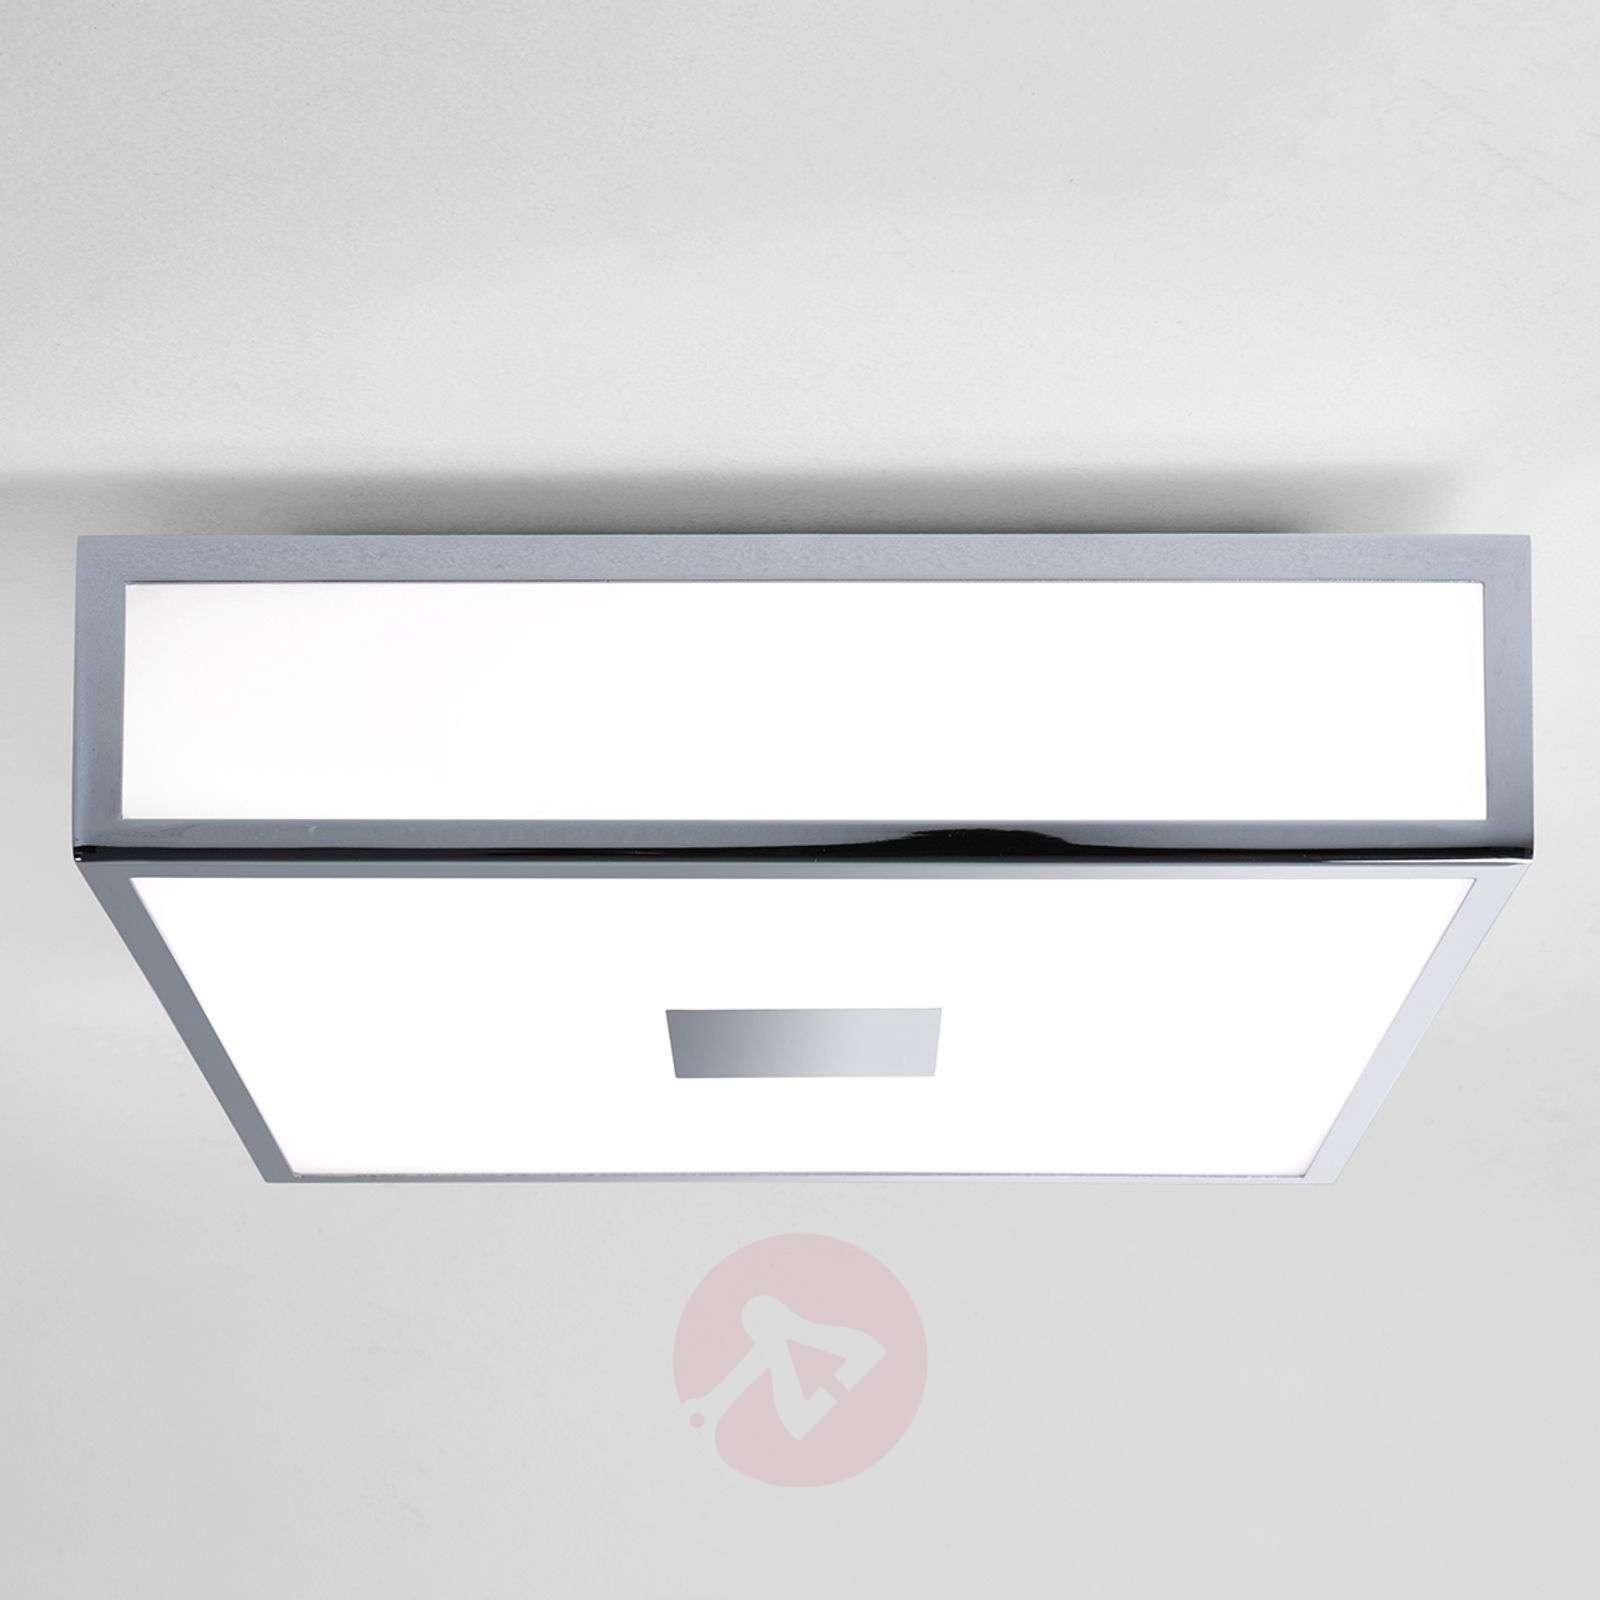 Kulmikas LED-kattovalaisin Mashiko, IP44-1020550-01